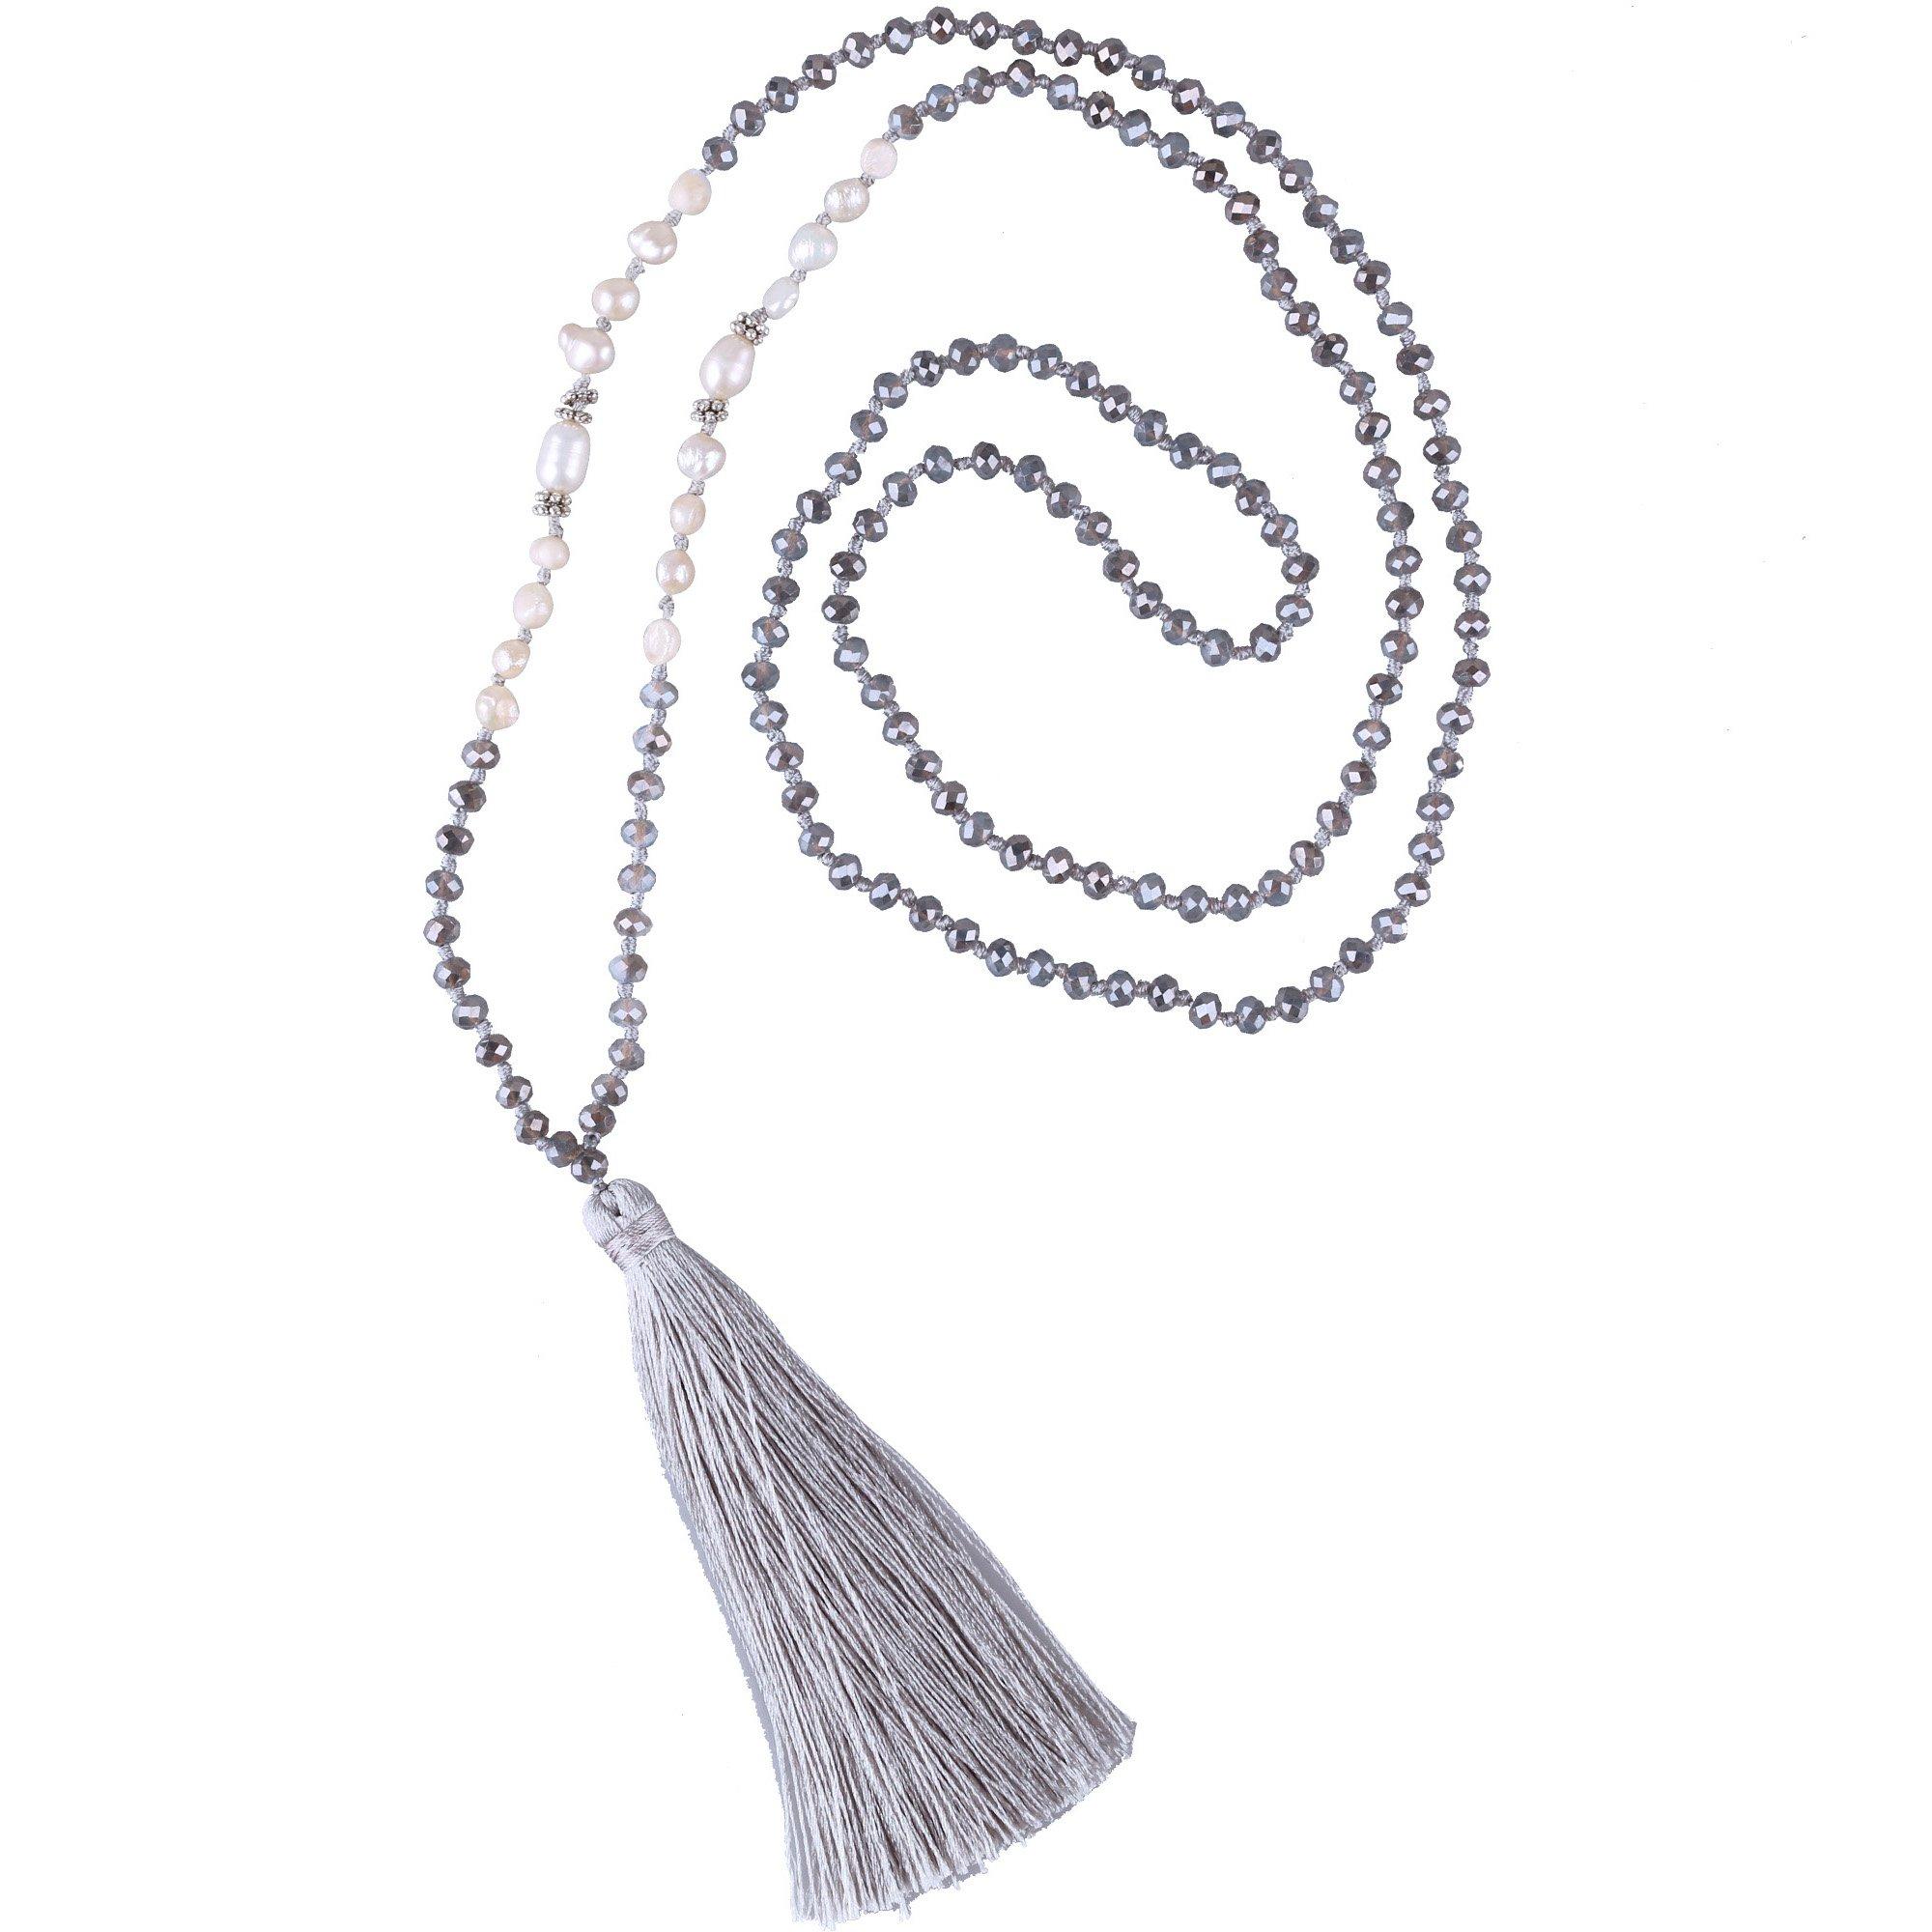 C·QUAN CHI Handmade Crystal Beaded Necklace Women Girls Tassel Pendant Necklace Statement Strand Necklace Gifts Jewelry for Women Gifts for Girls